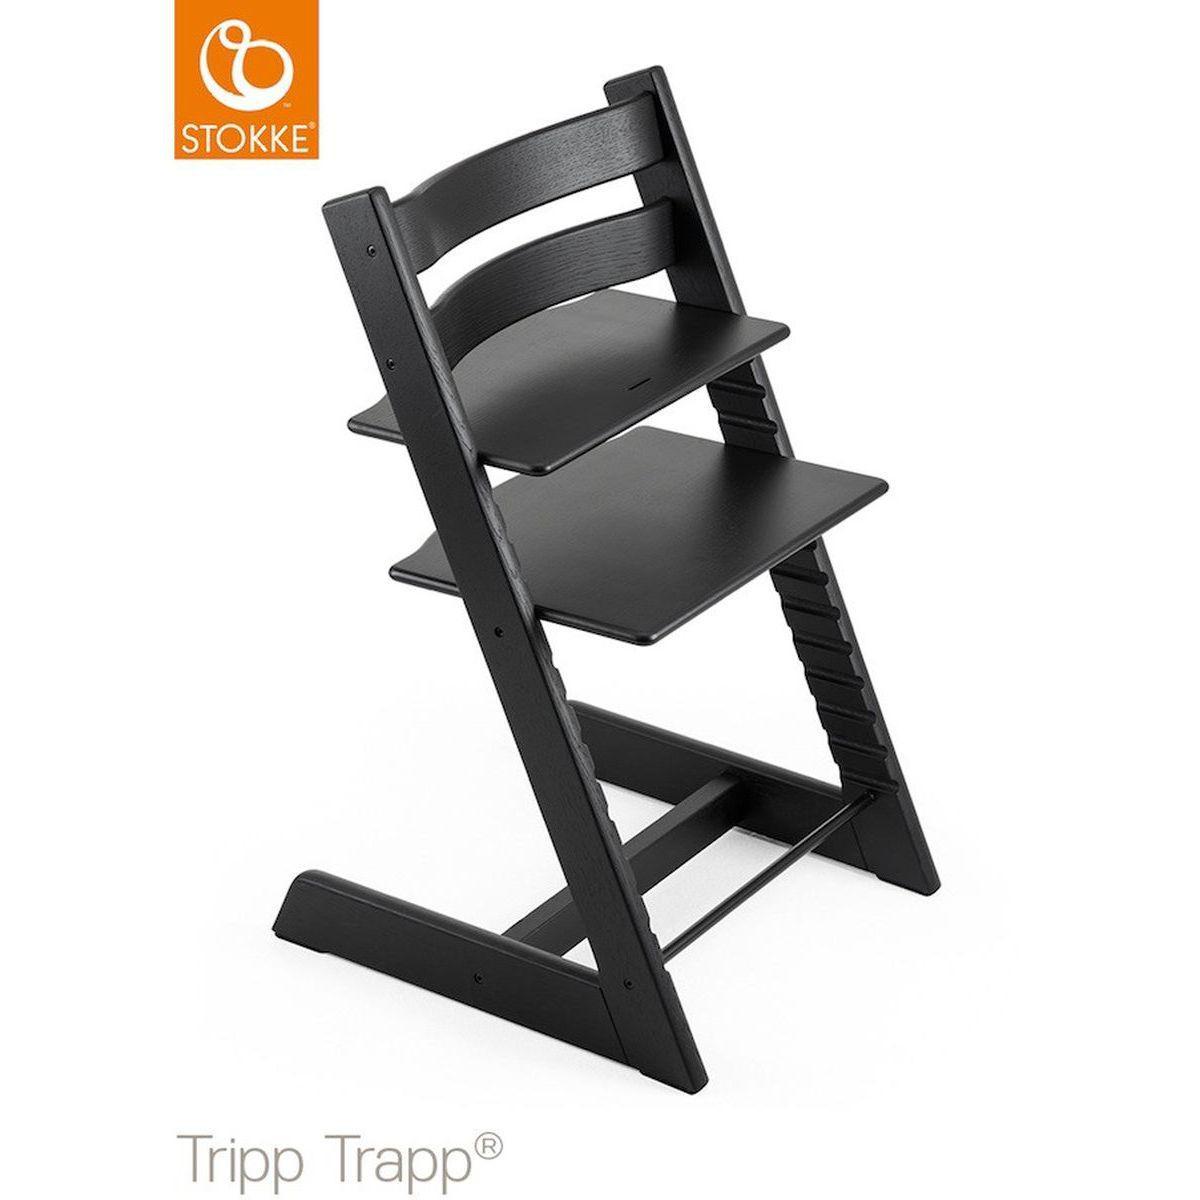 Chaise haute chêne TRIPP TRAPP Stokke noir